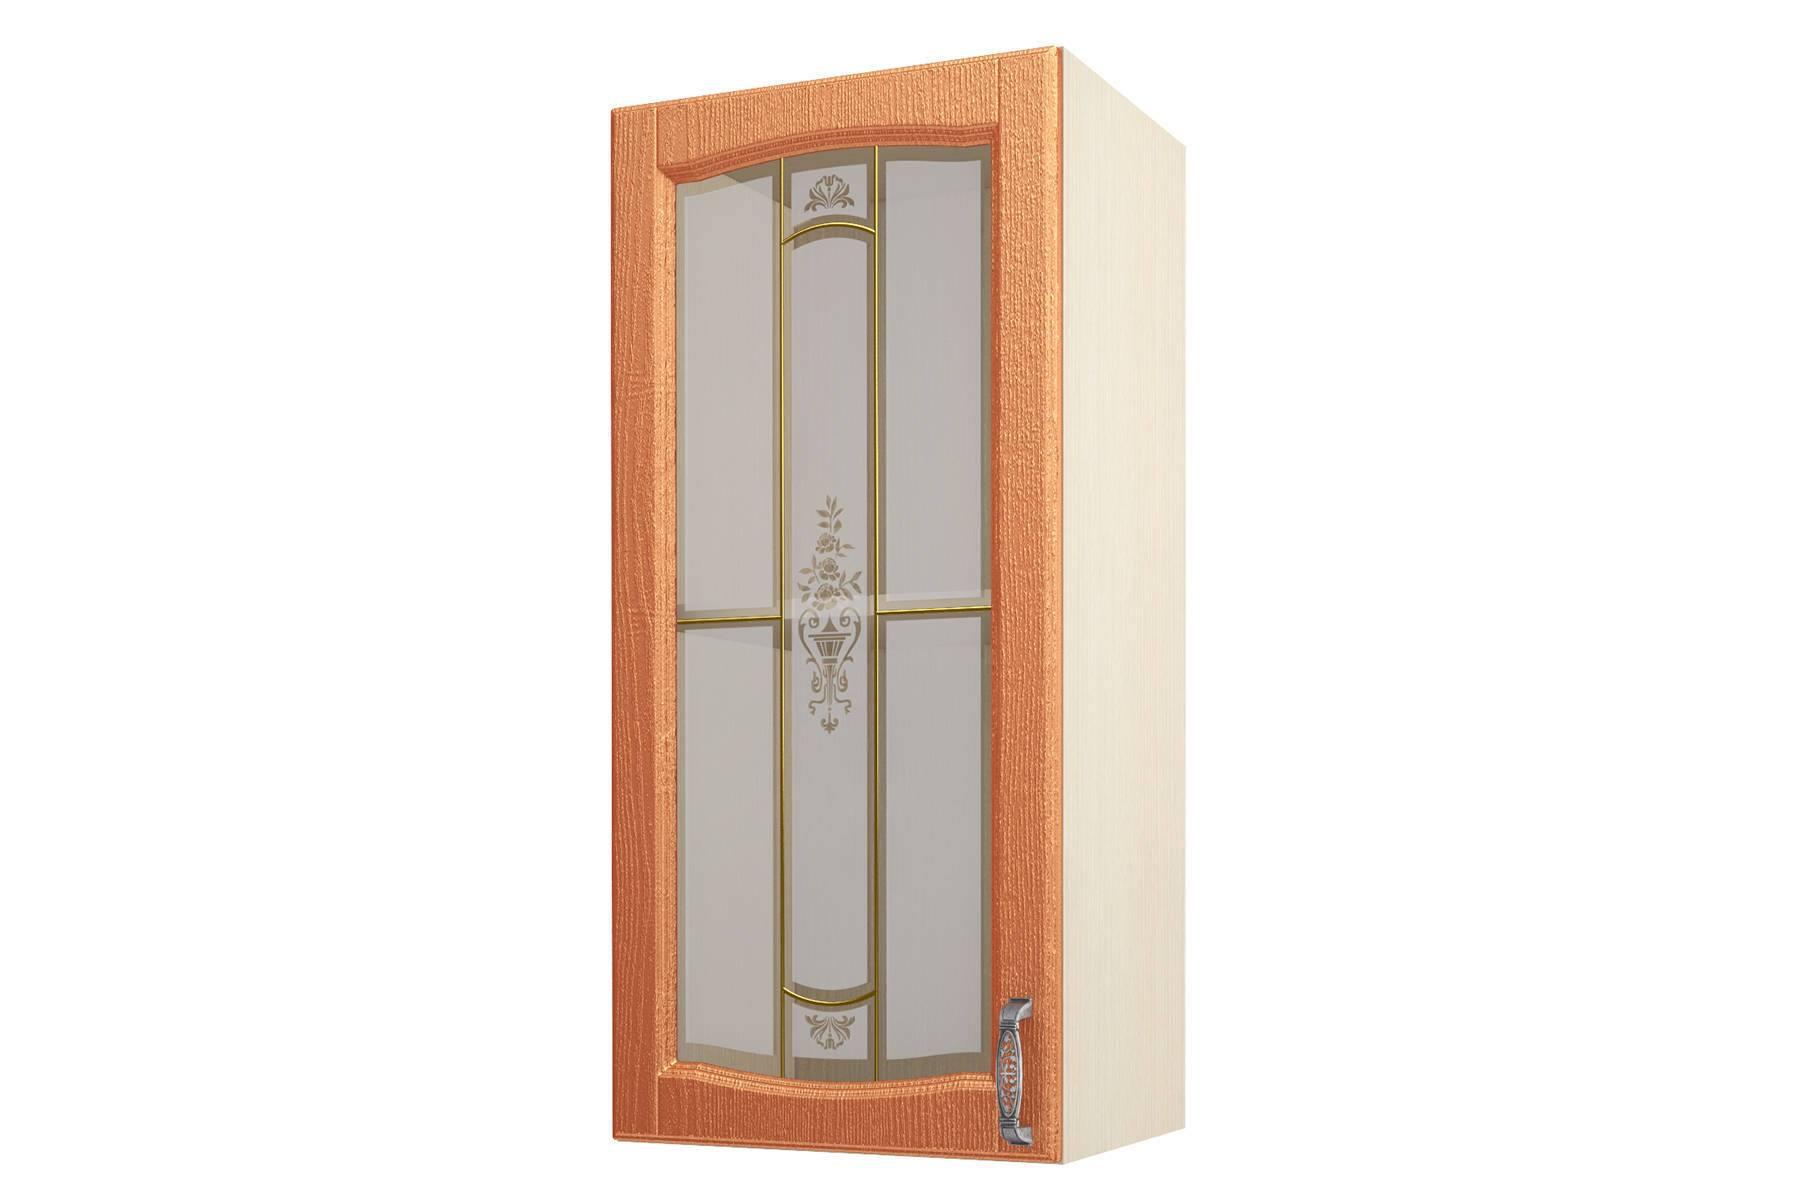 Равенна ART Шкаф-витрина 45 (Н-96), 1 дверь равенна art шкаф навесной 40 н 96 1 дверь